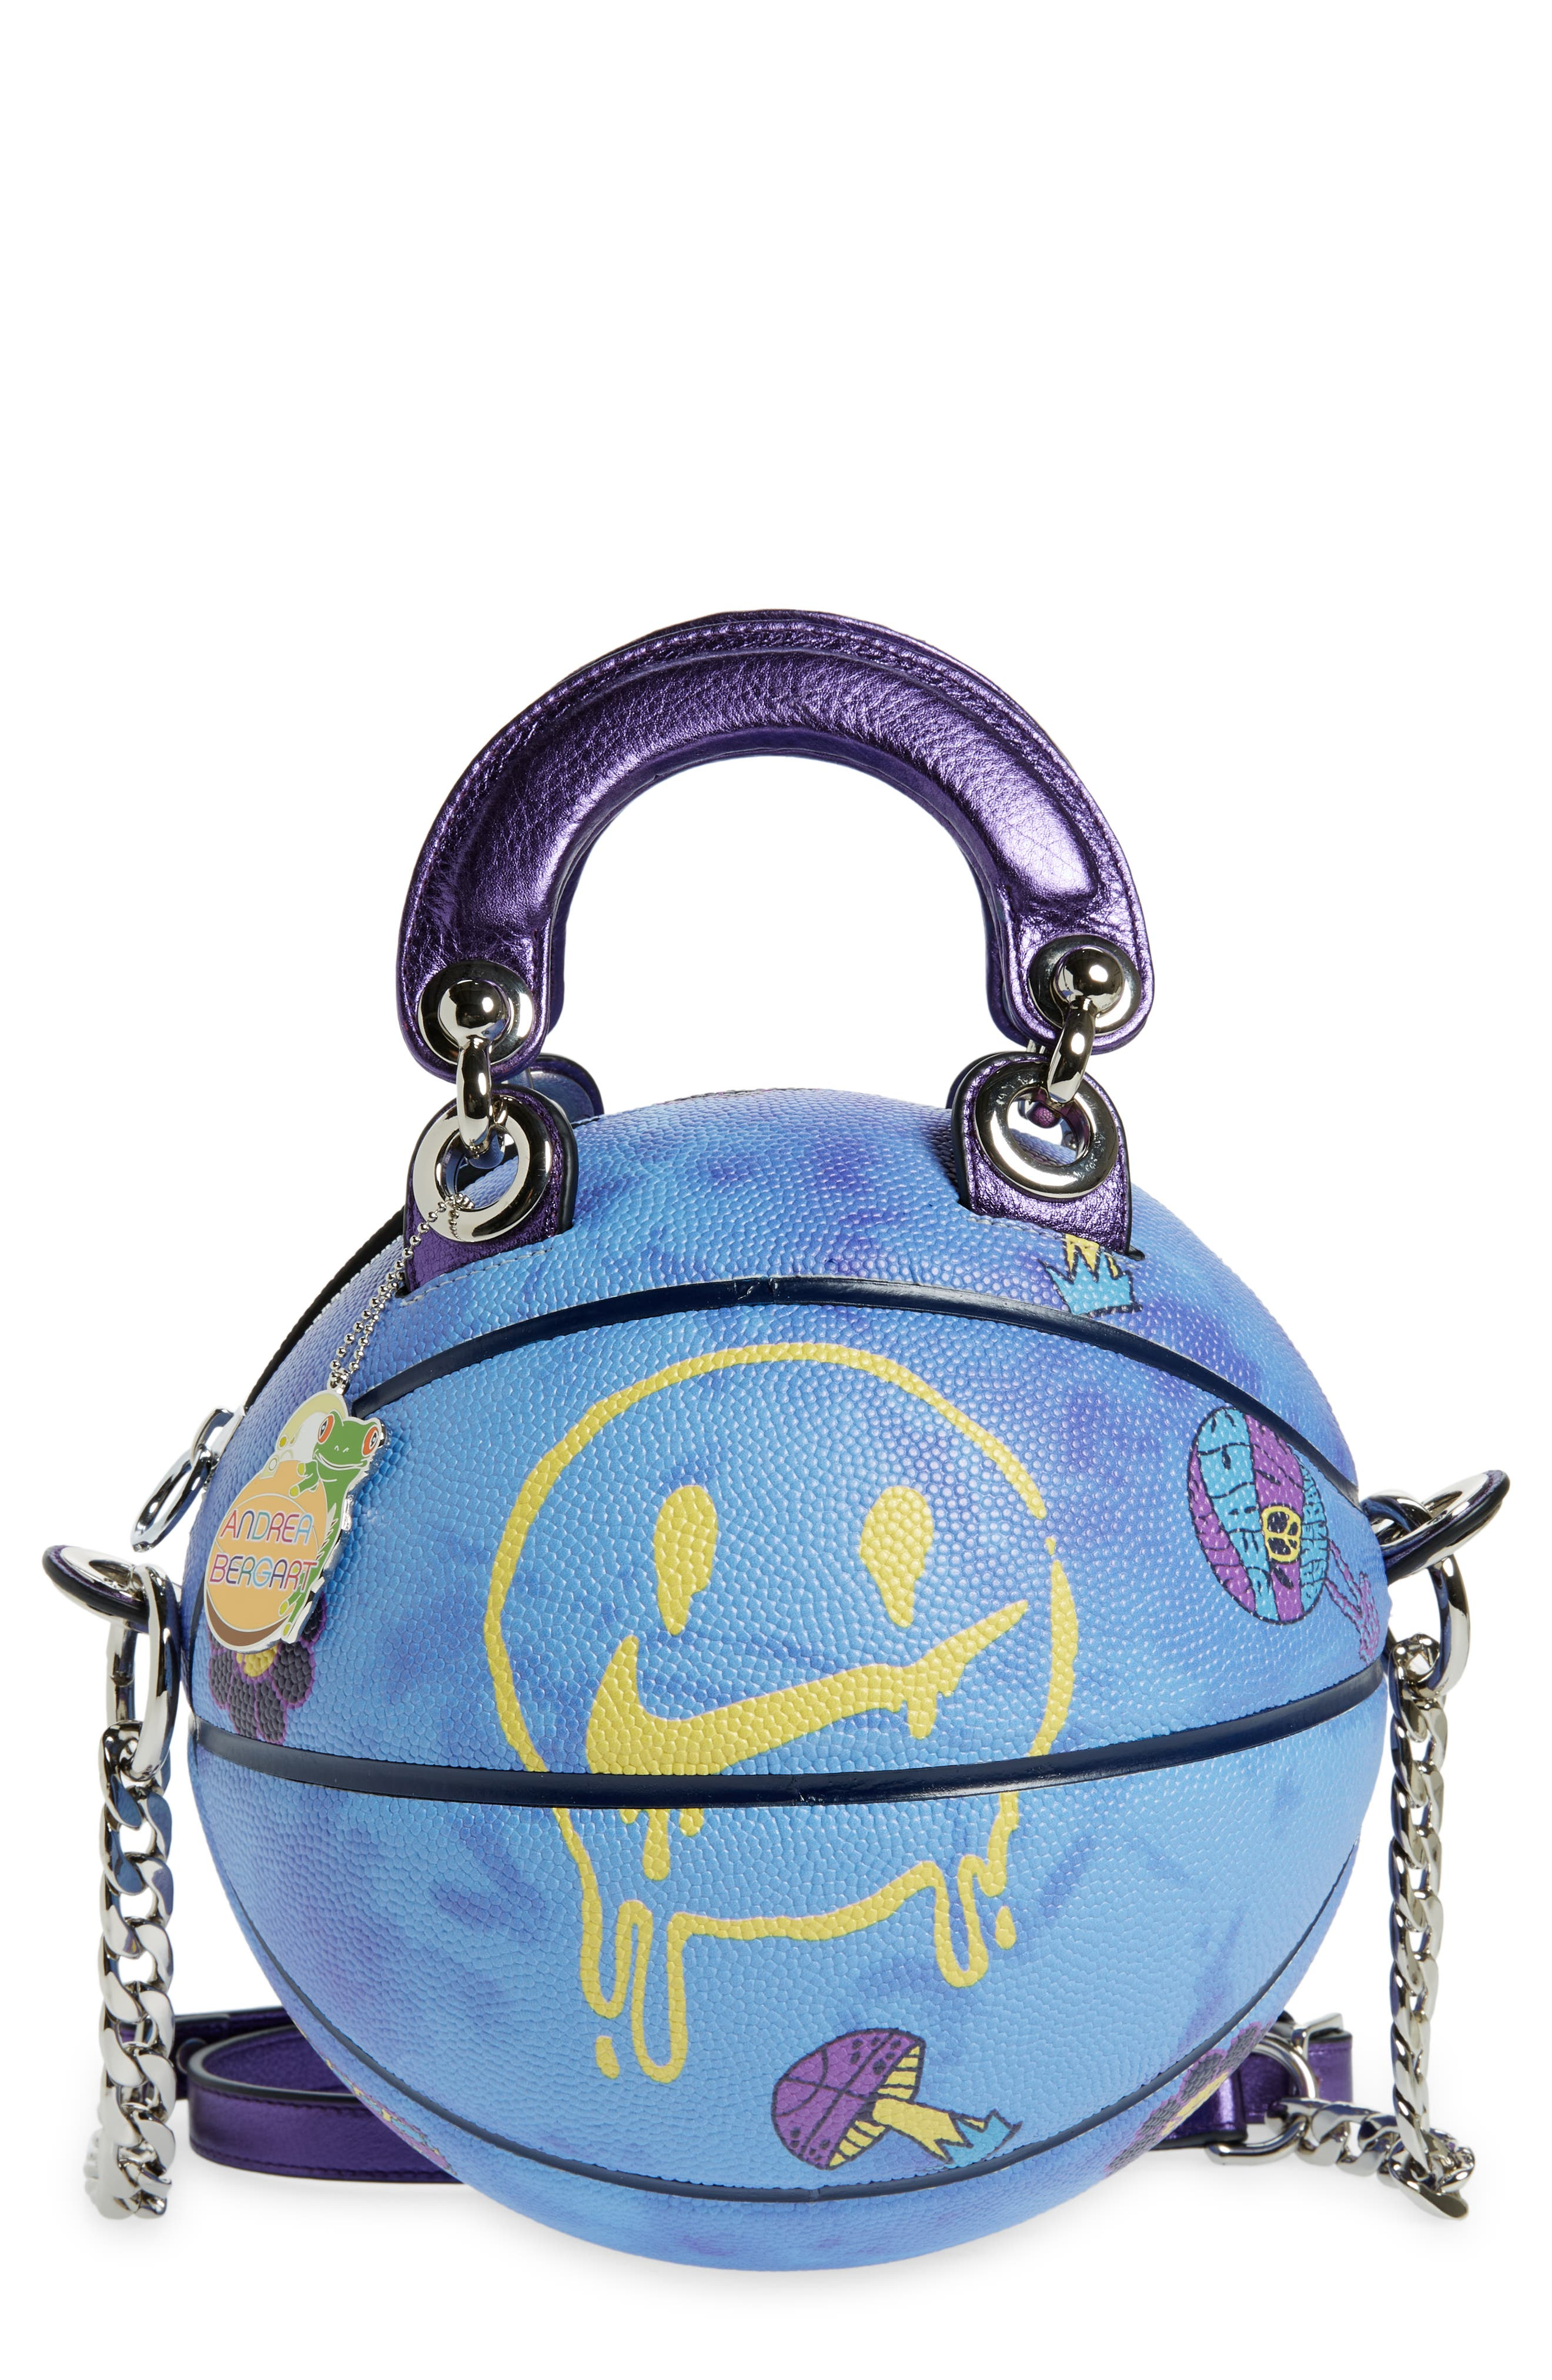 Full Basketball Top Handle Bag